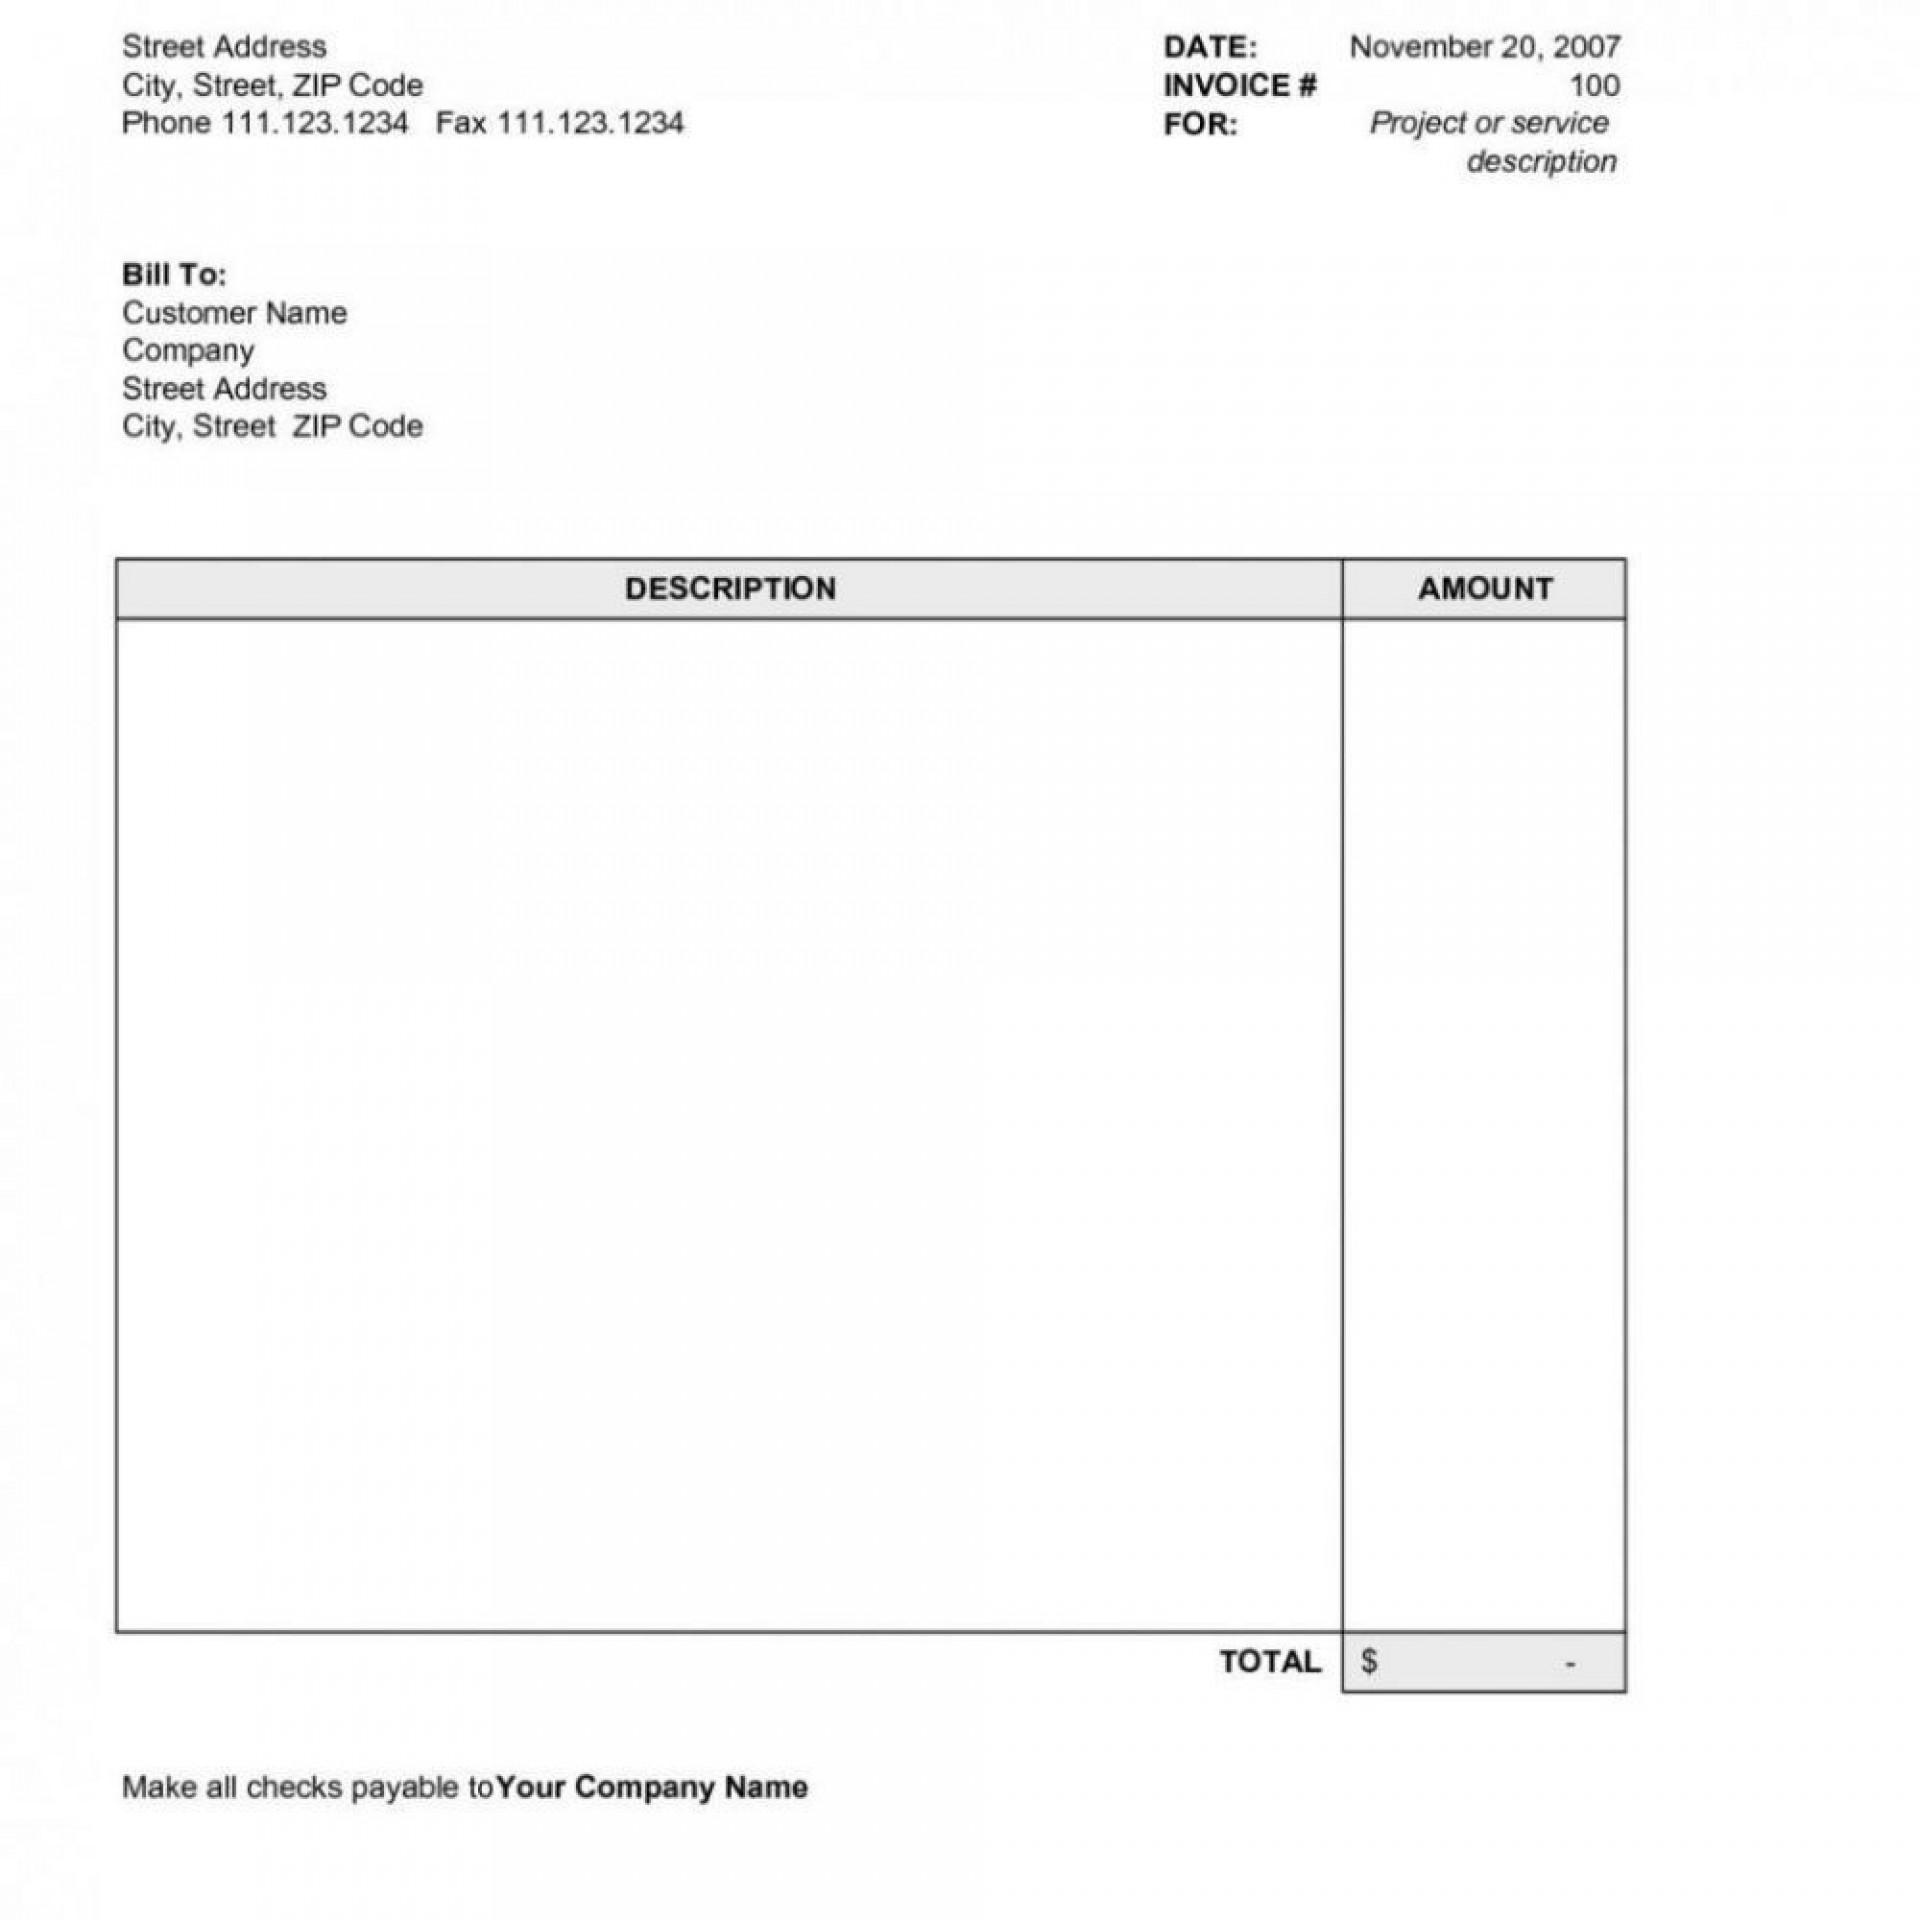 000 Unique Invoice Template In Word Example  Document Free Proforma1920